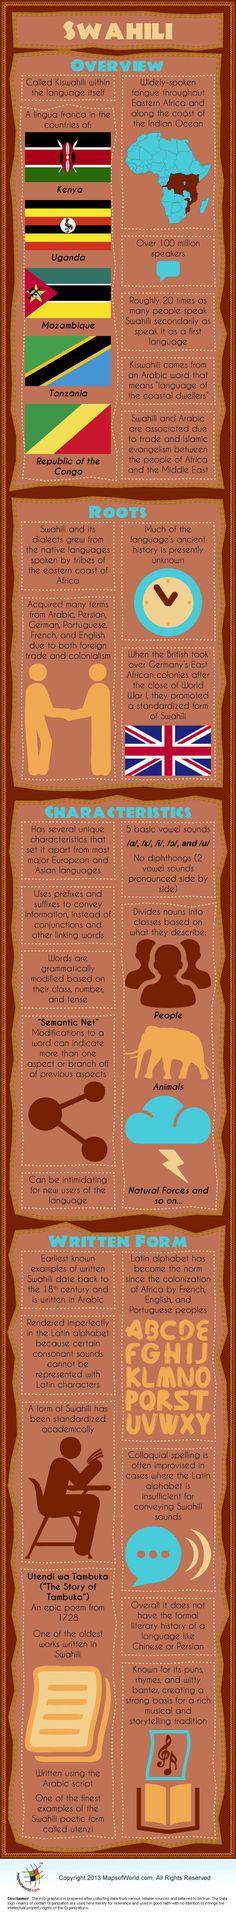 Kiswahili Infographic